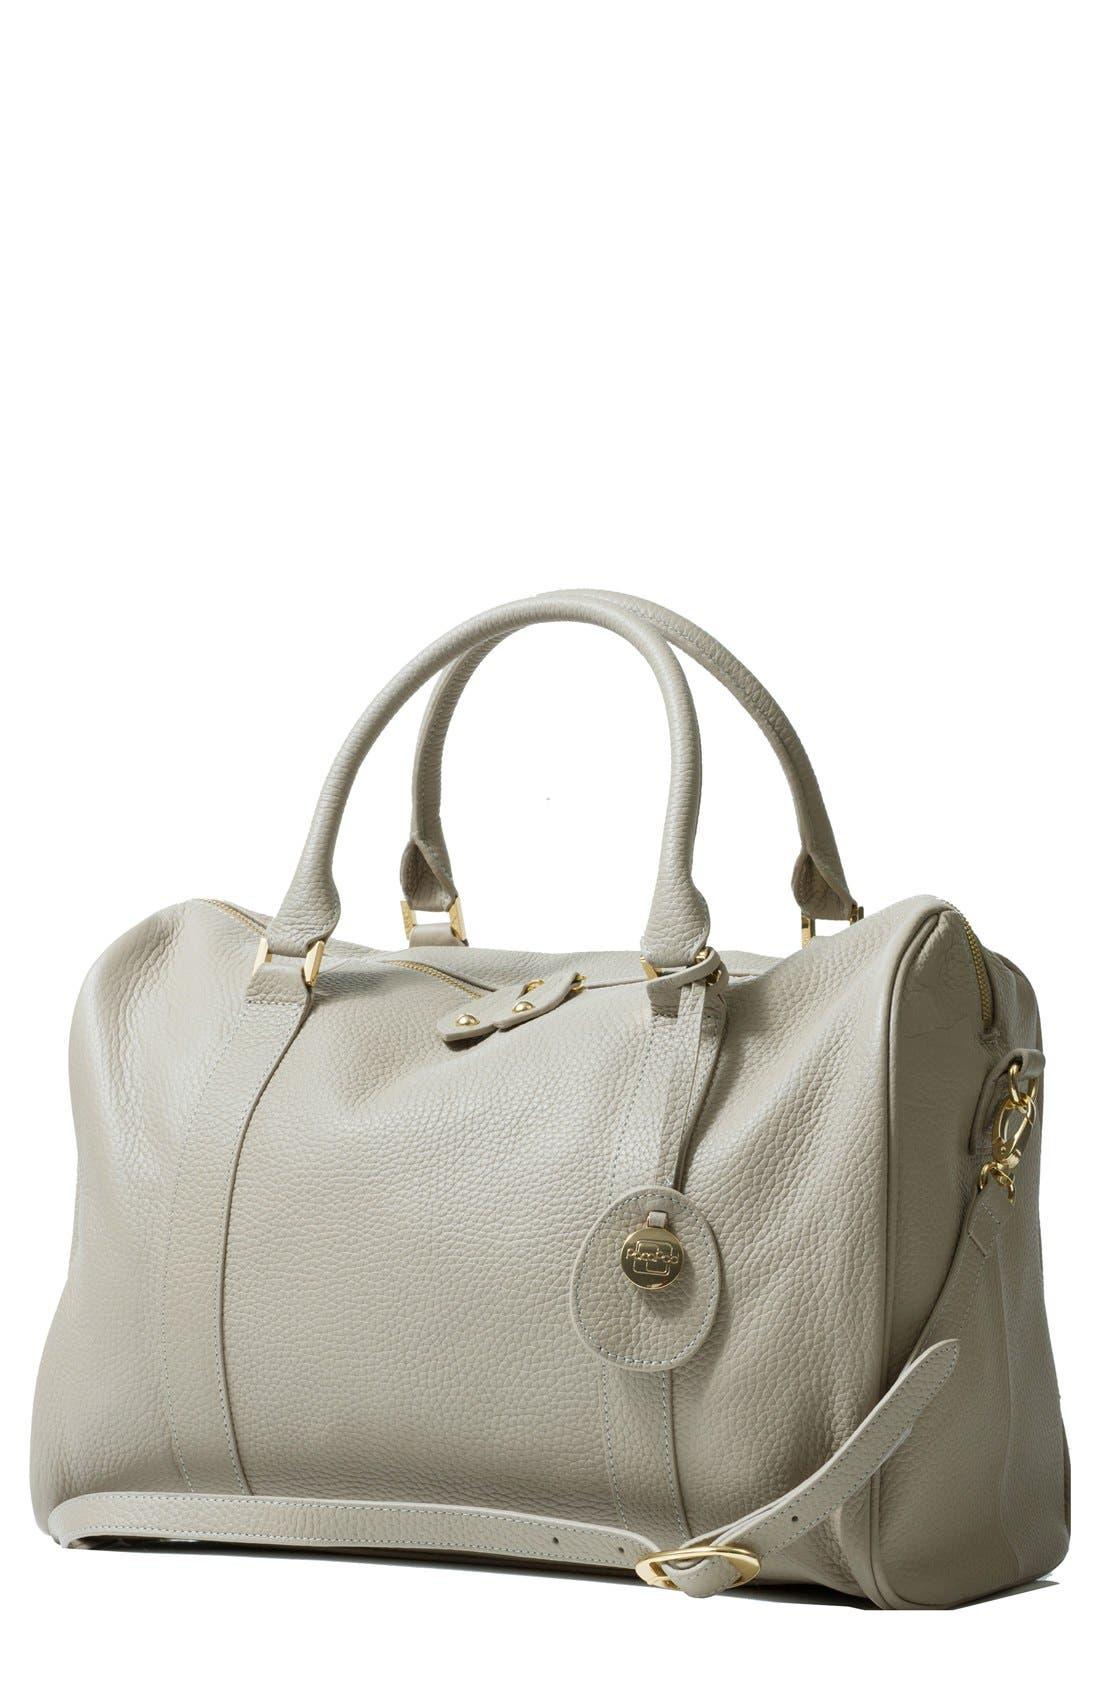 Main Image - PacaPod 'Firenze' Leather Diaper Bag